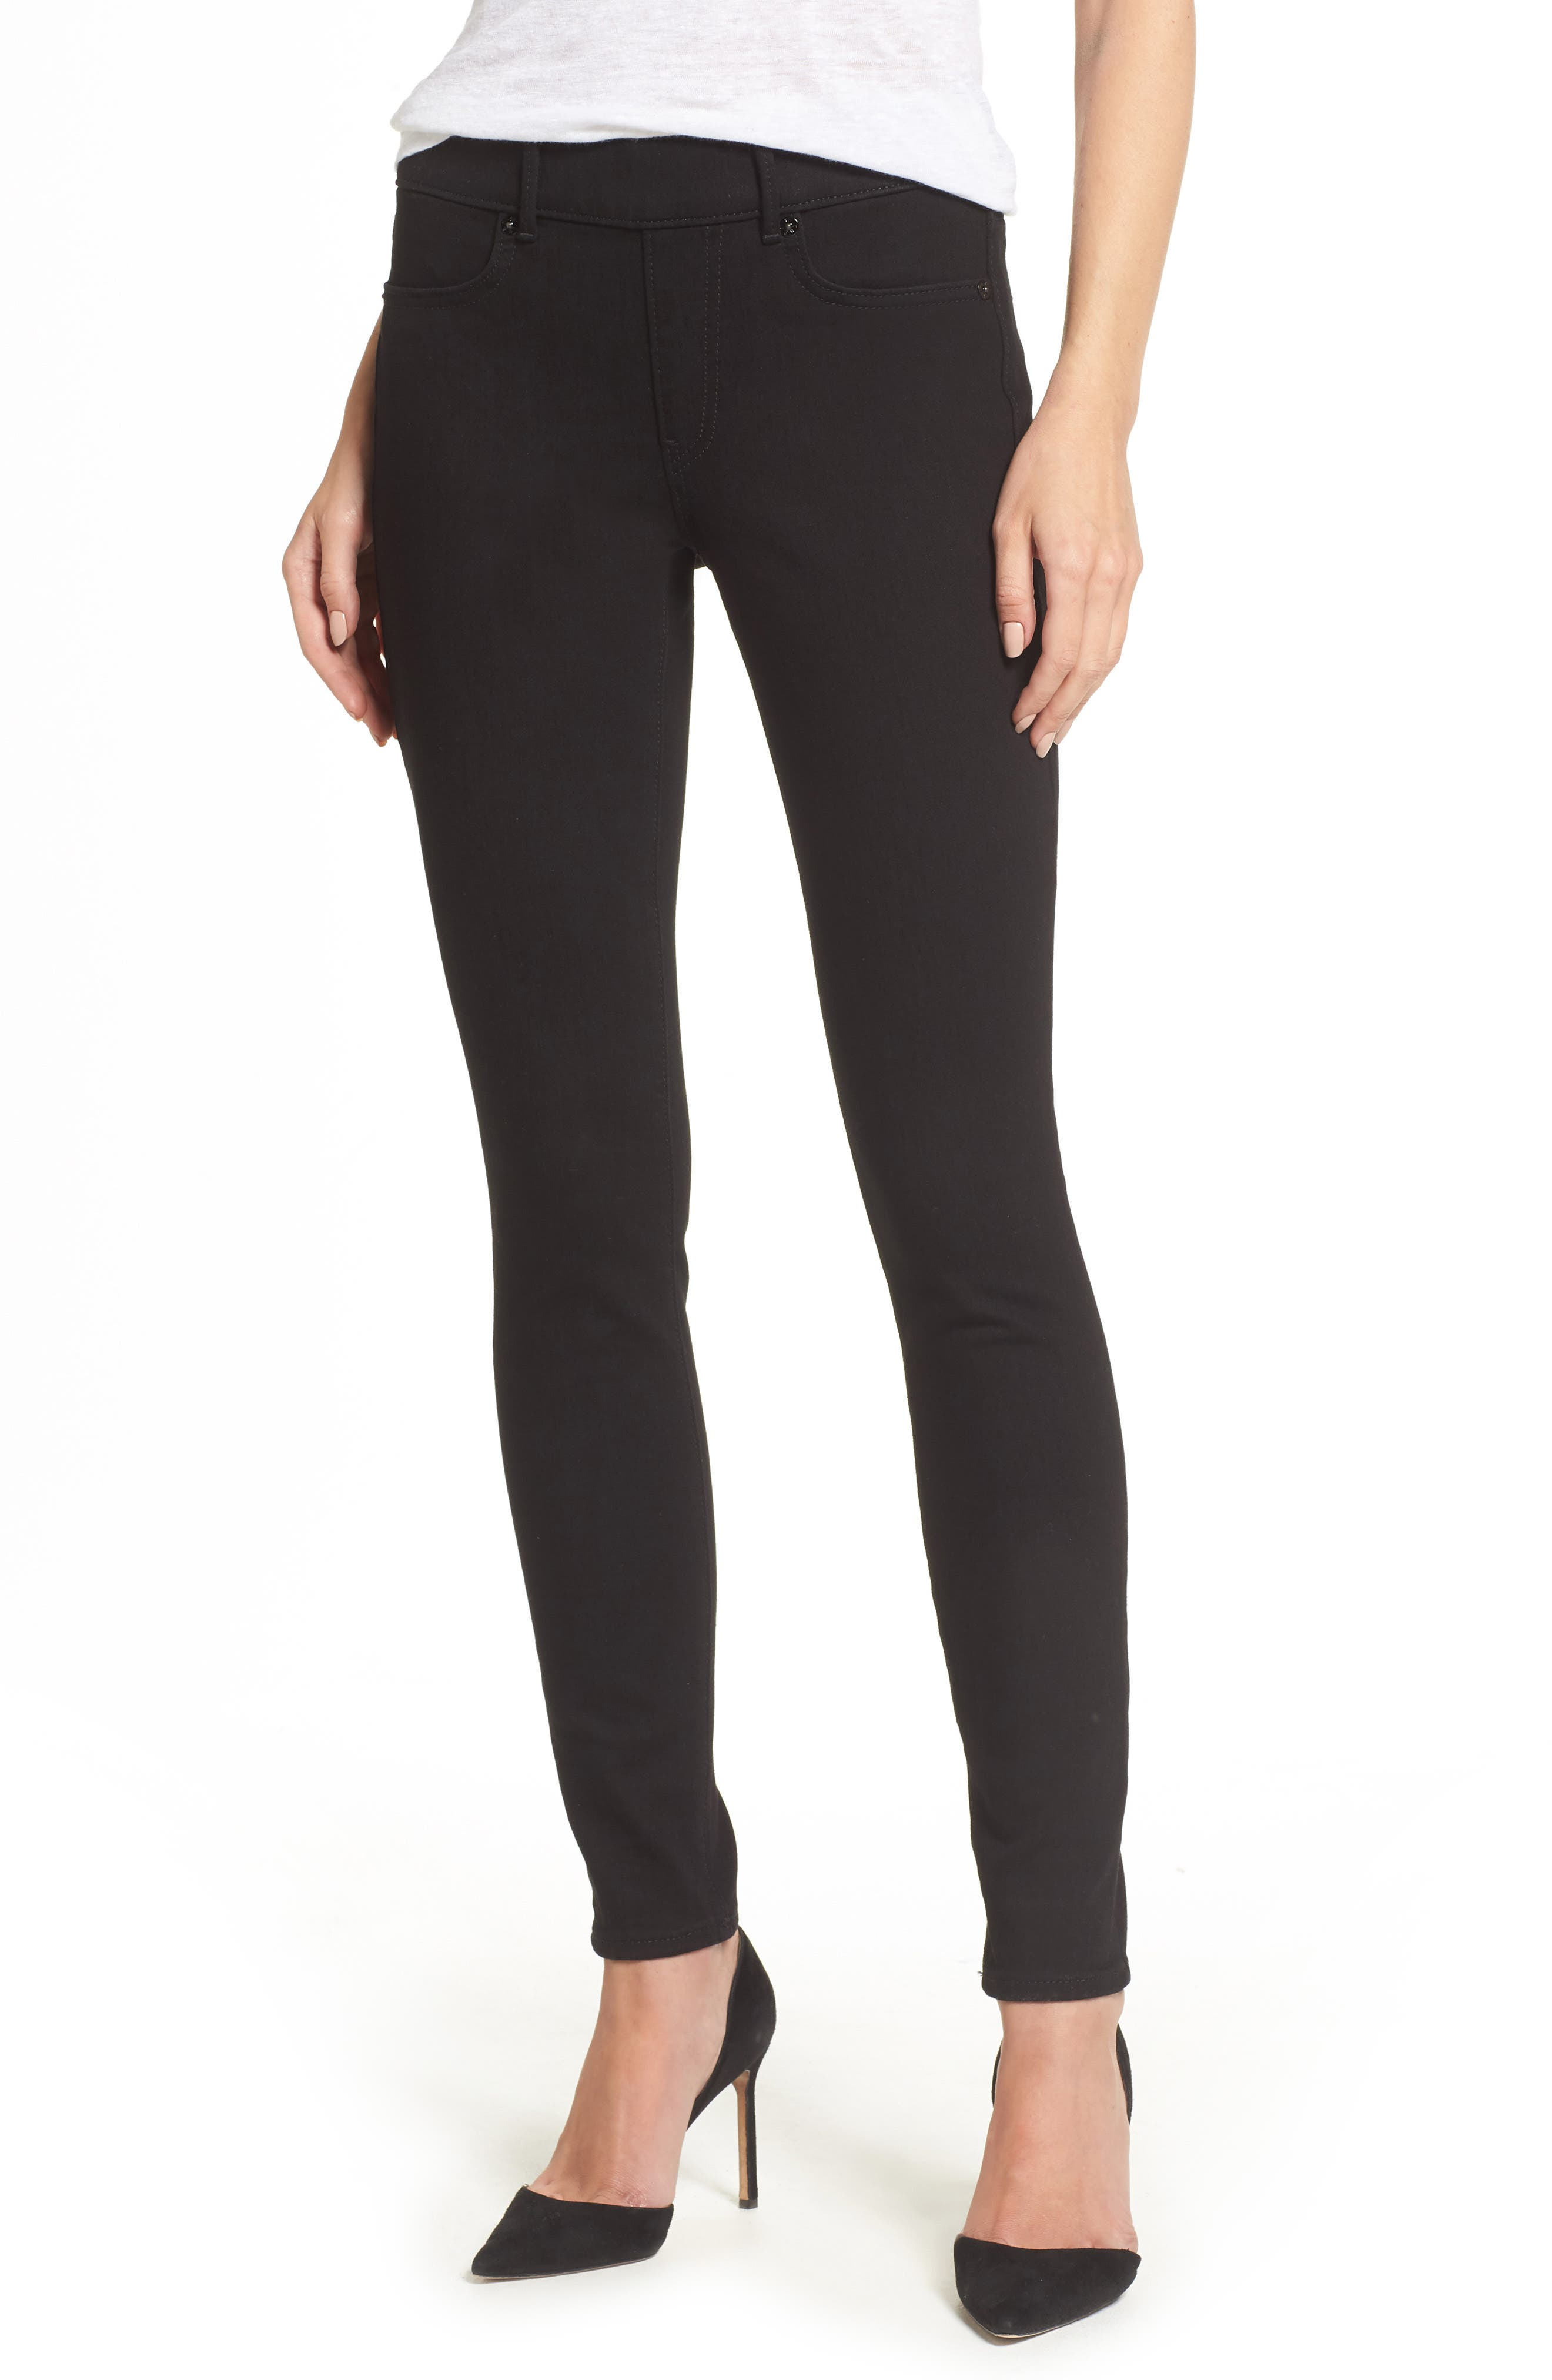 Main Image - True Religion Brand Jeans Jennie Curvy Runway Leggings (Body Rinse Black)